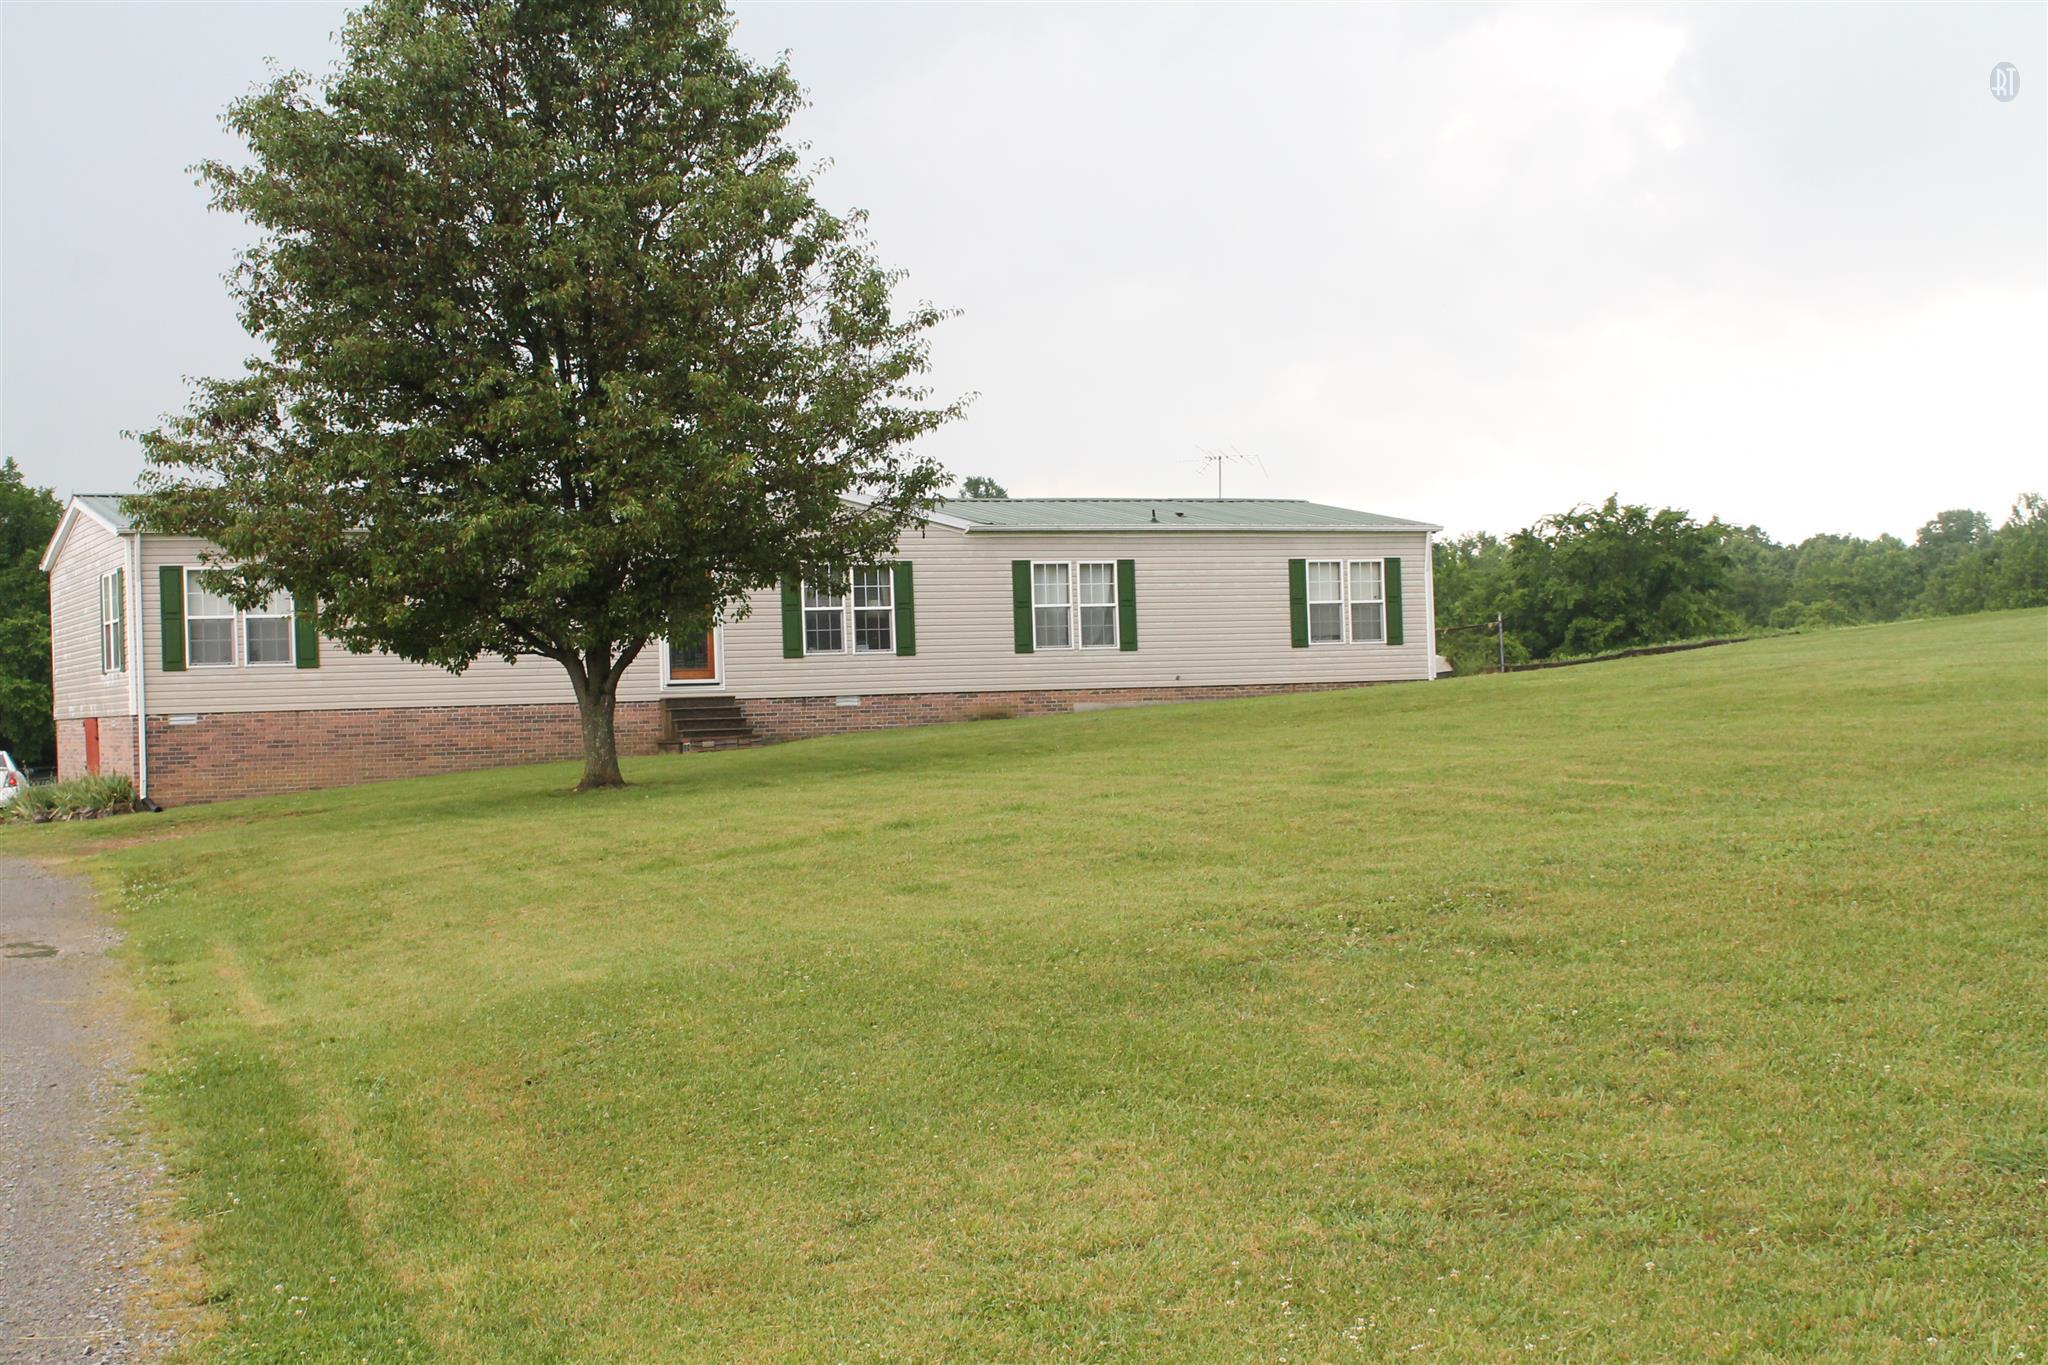 295 Crenshaw Rd, Hartsville, TN 37074